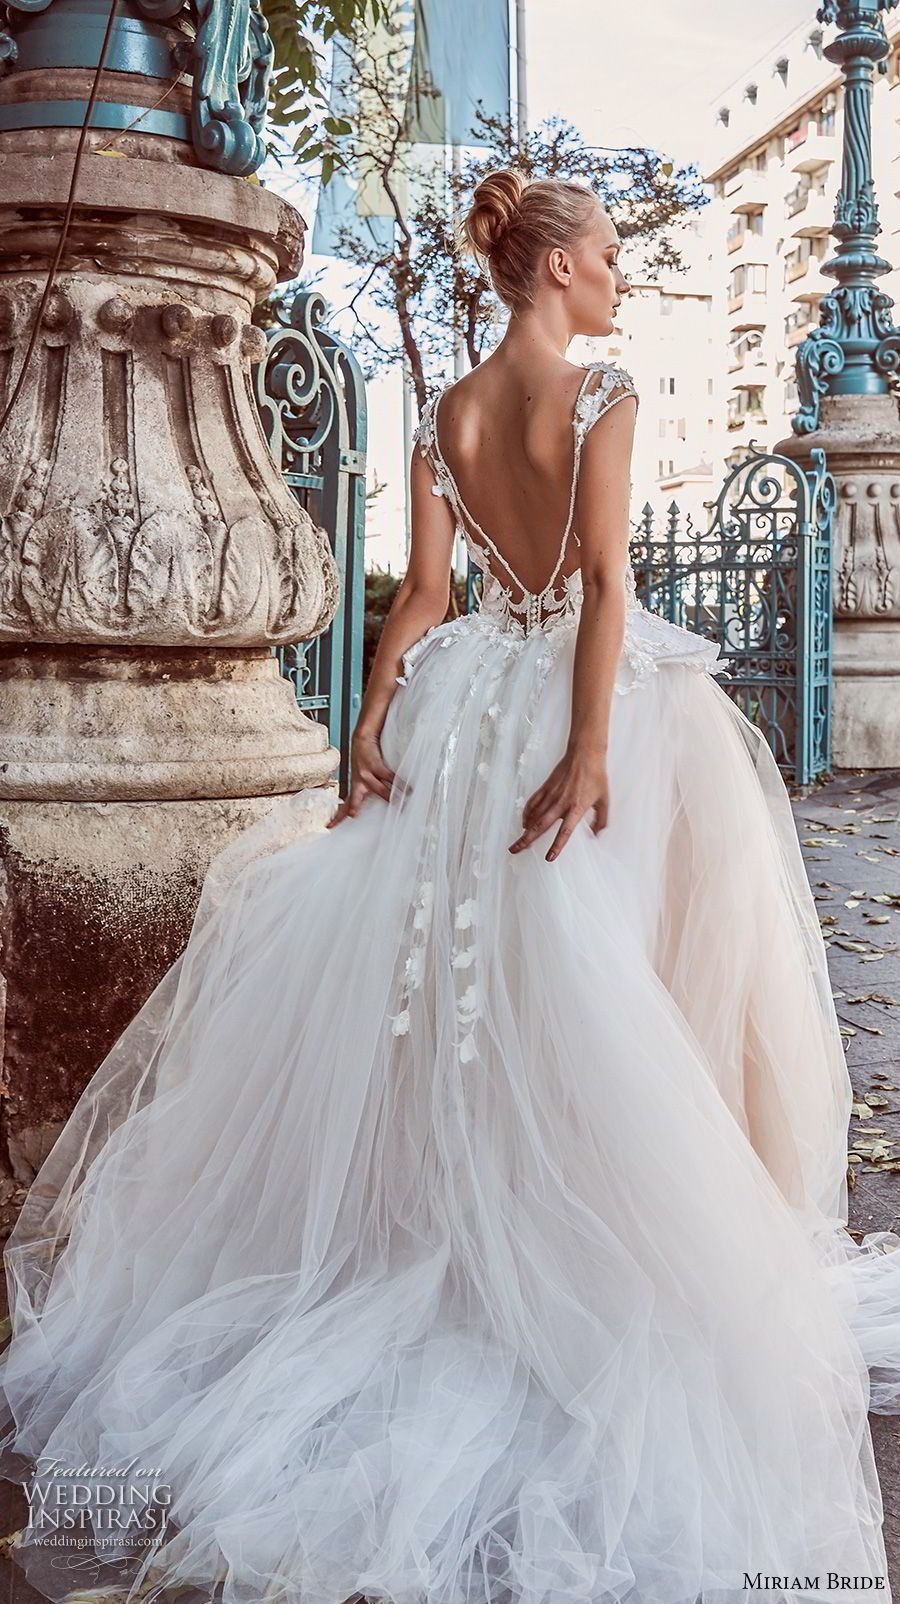 Miriams bride bridal cap sleeves illusion bateau sweetheart